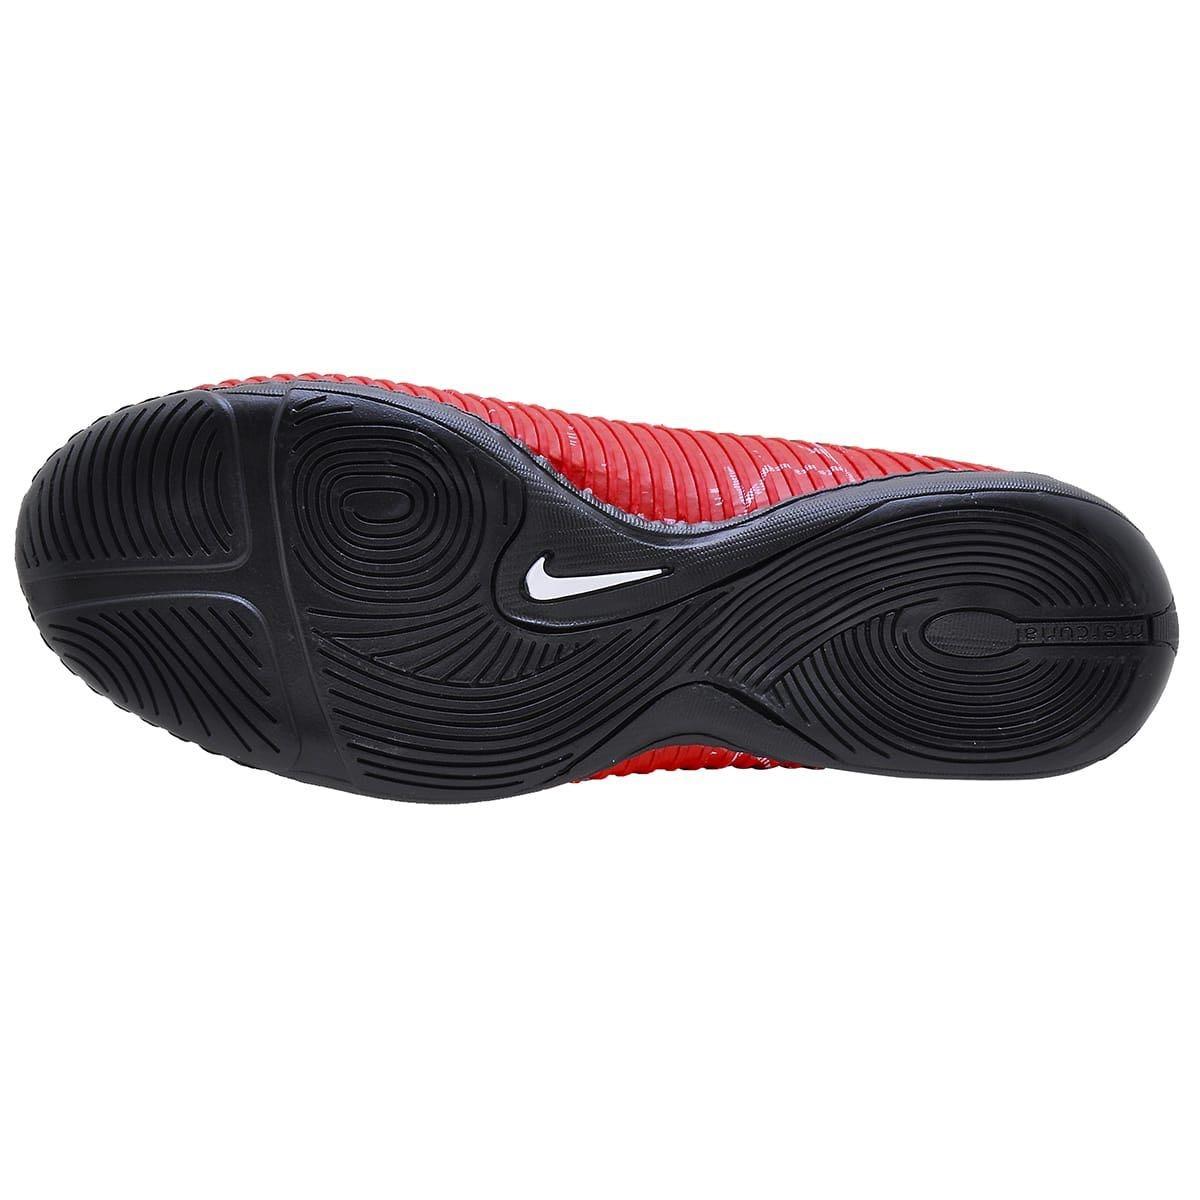 kit 3 chuteiras botinha adulto futsal preço promocional. Carregando zoom. b65e090be9ac3